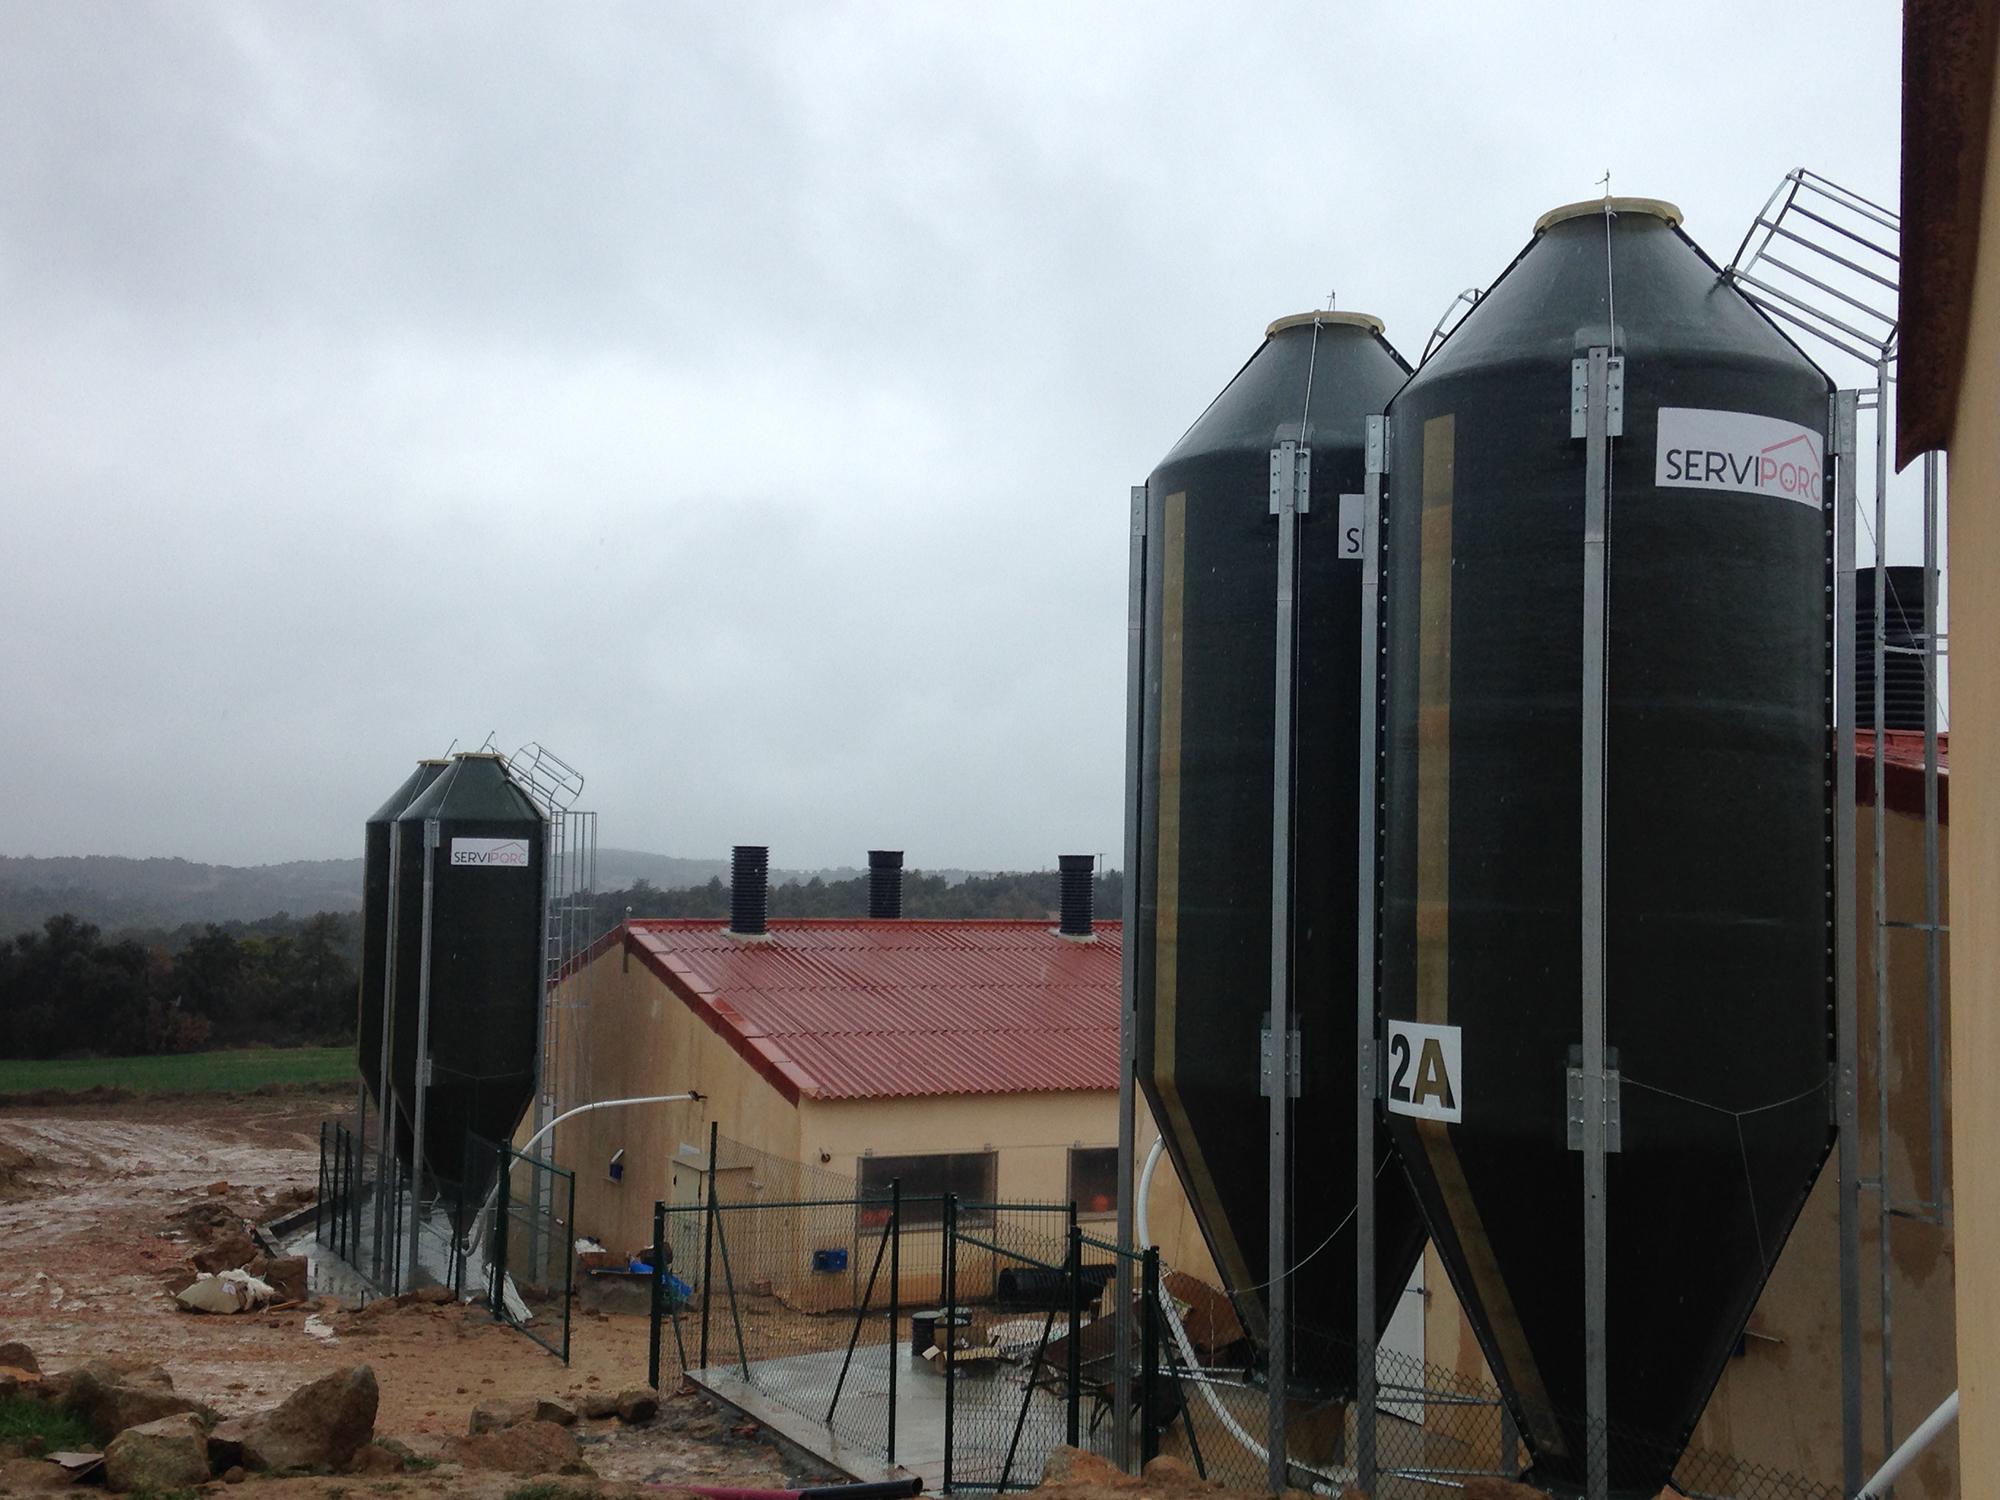 Vista silos de poliester.